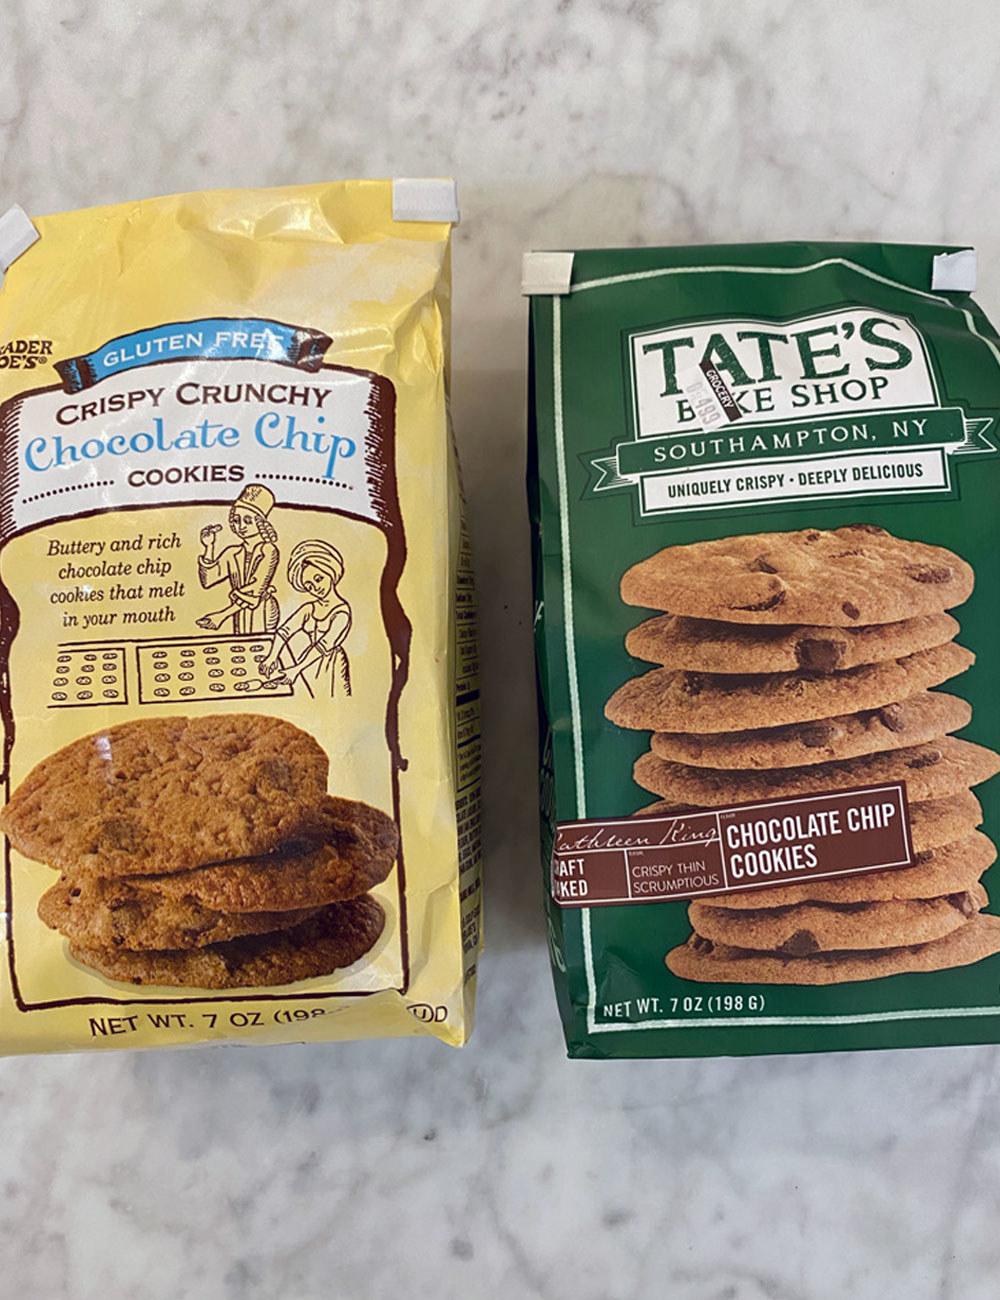 Trader Joe's crispy chocolate chip cookies and Tate's cookies in bags